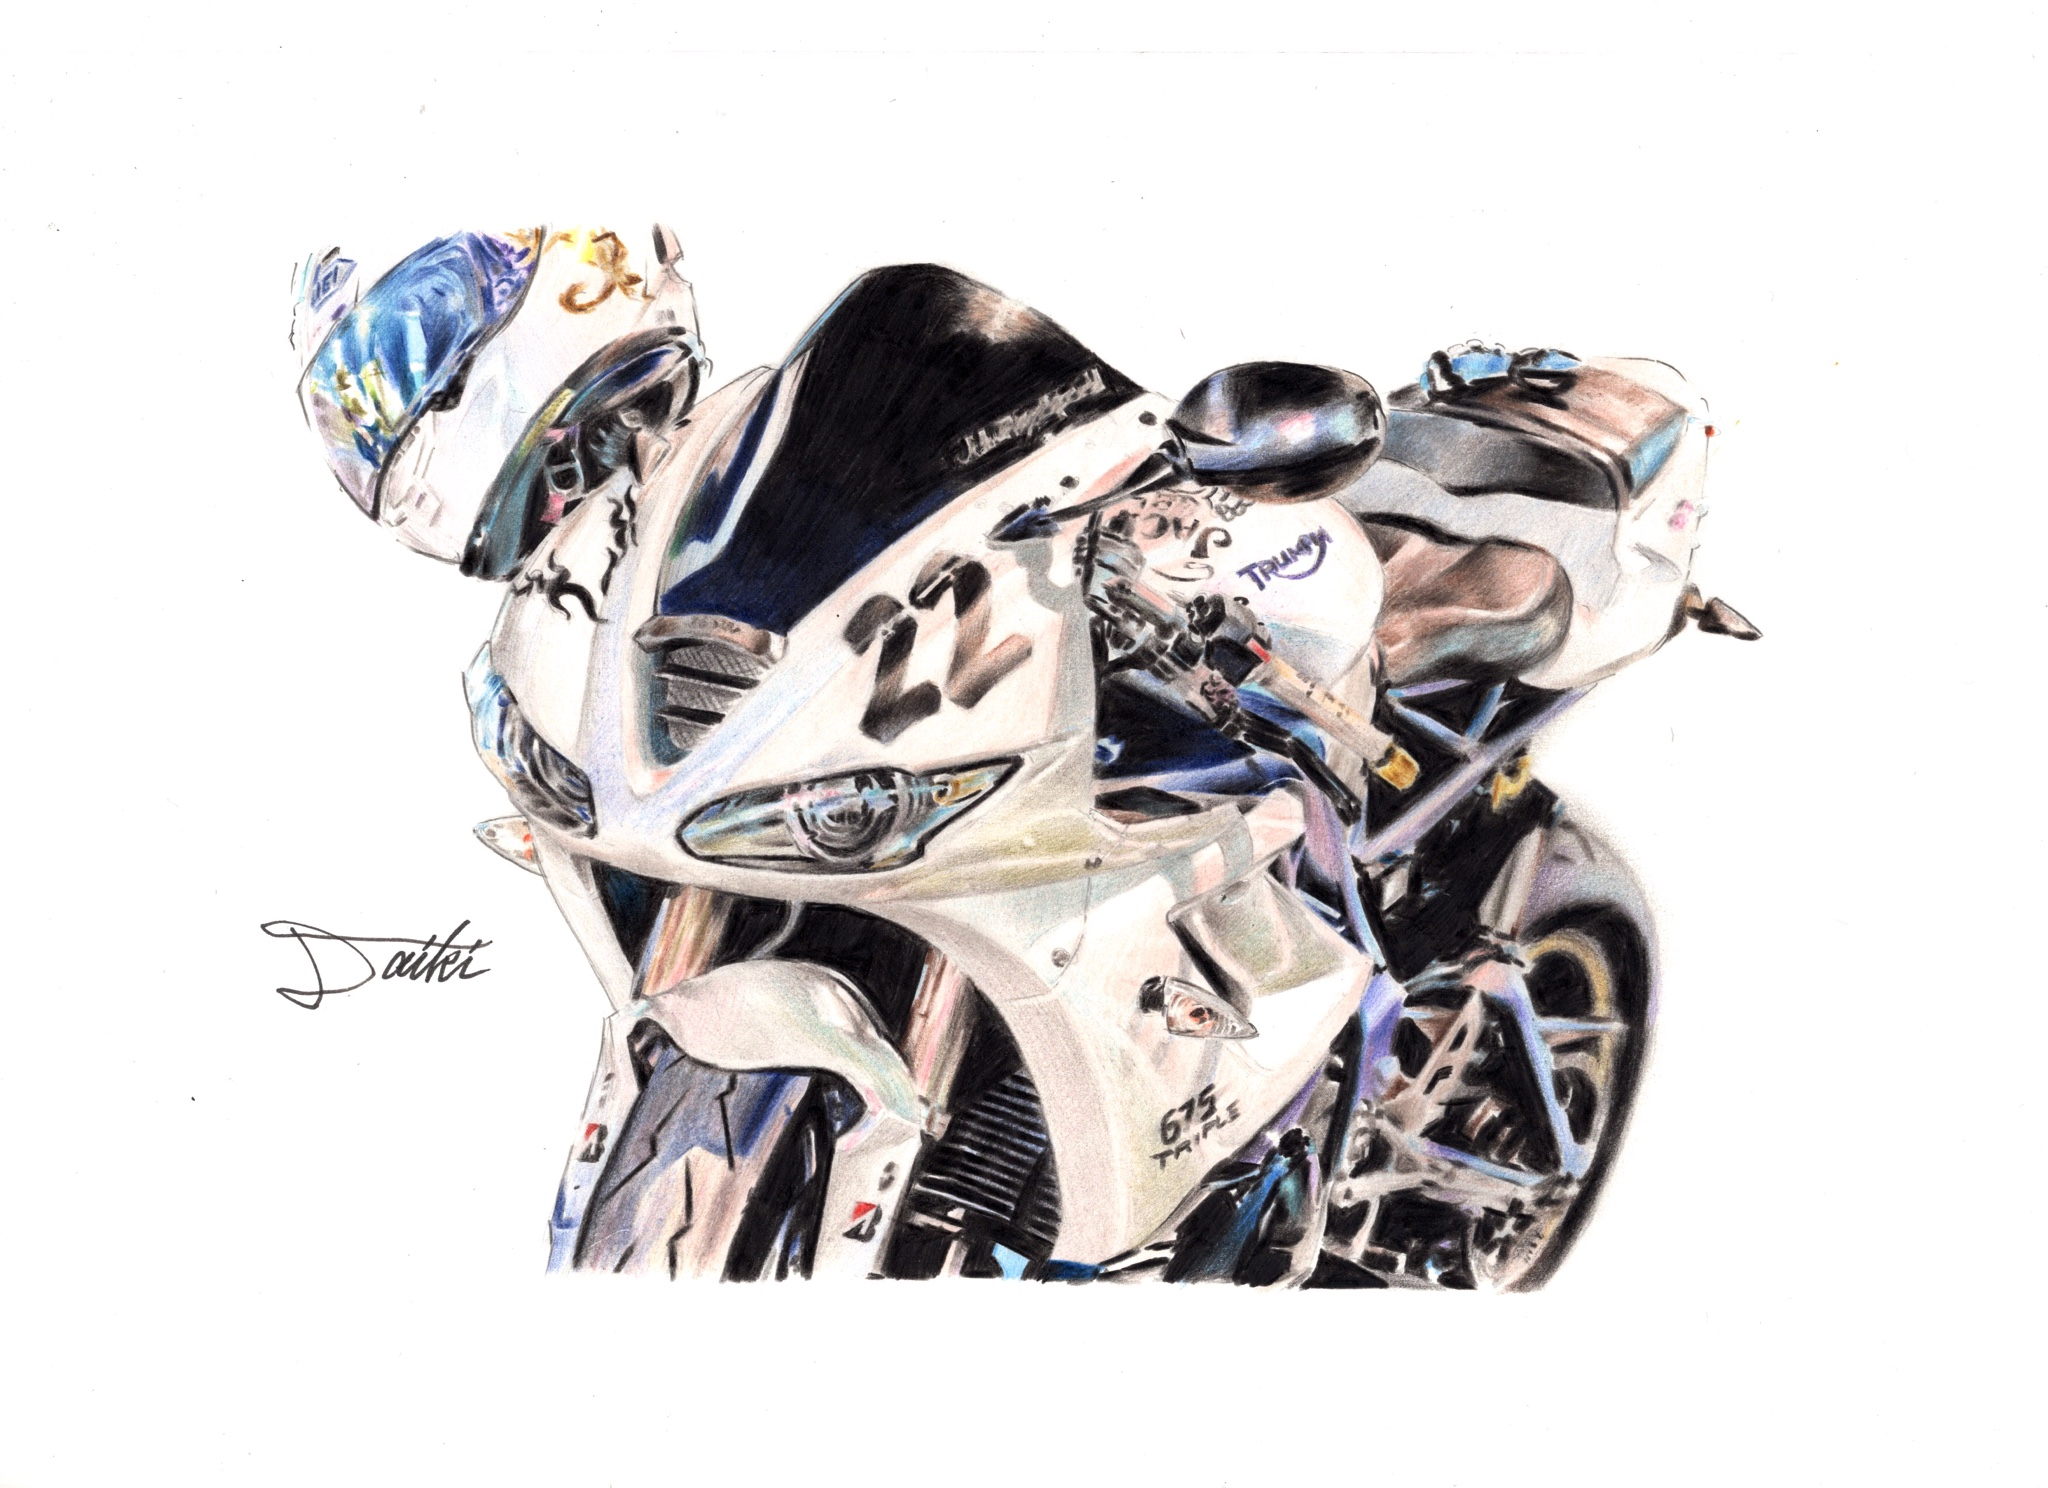 TRIUMPH Daytona675 色鉛筆イラスト